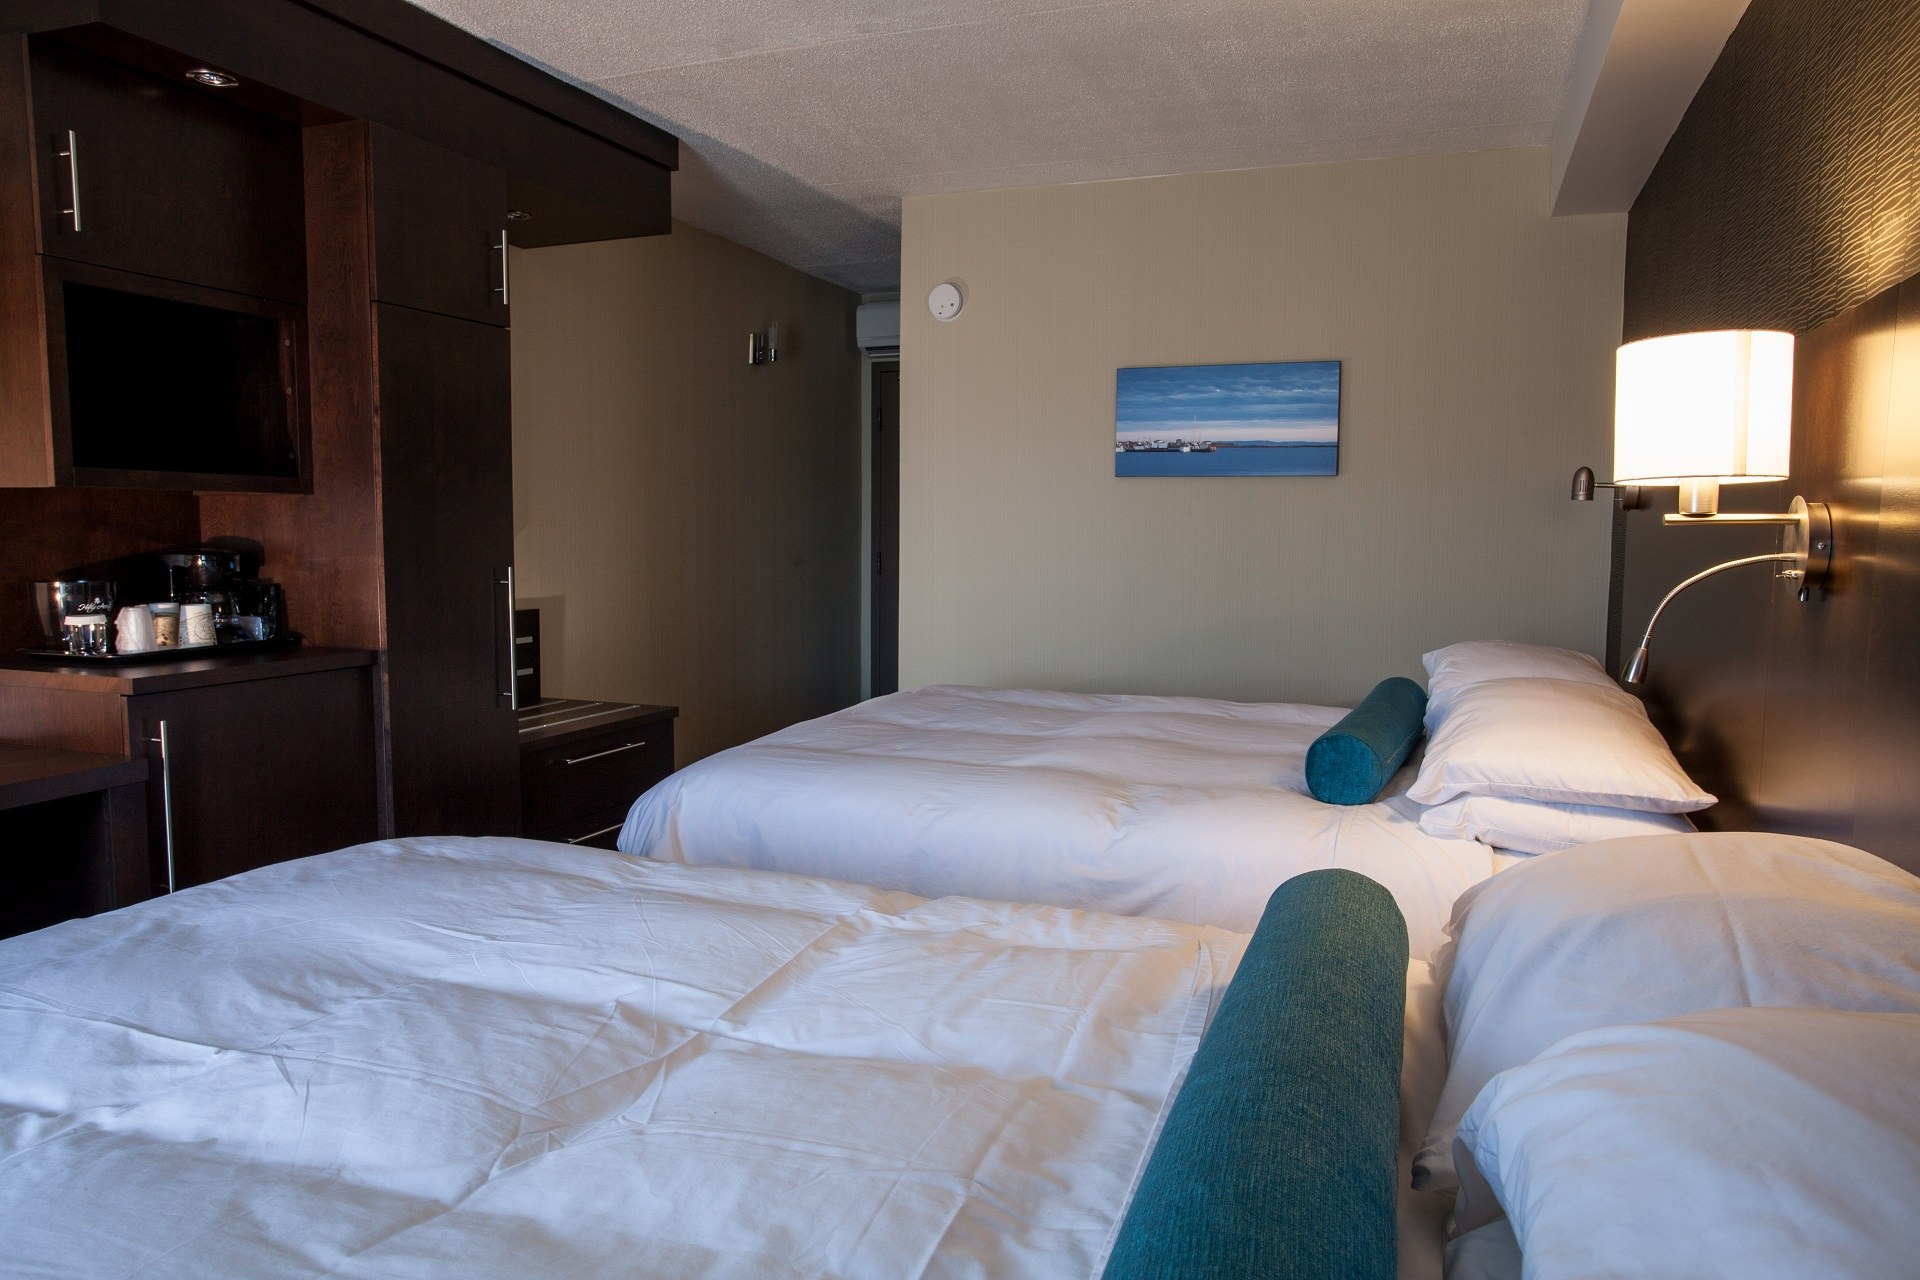 hotel-iles-de-la-madeleine-auberge-madeli-chambres-regulieres-lit-sofa